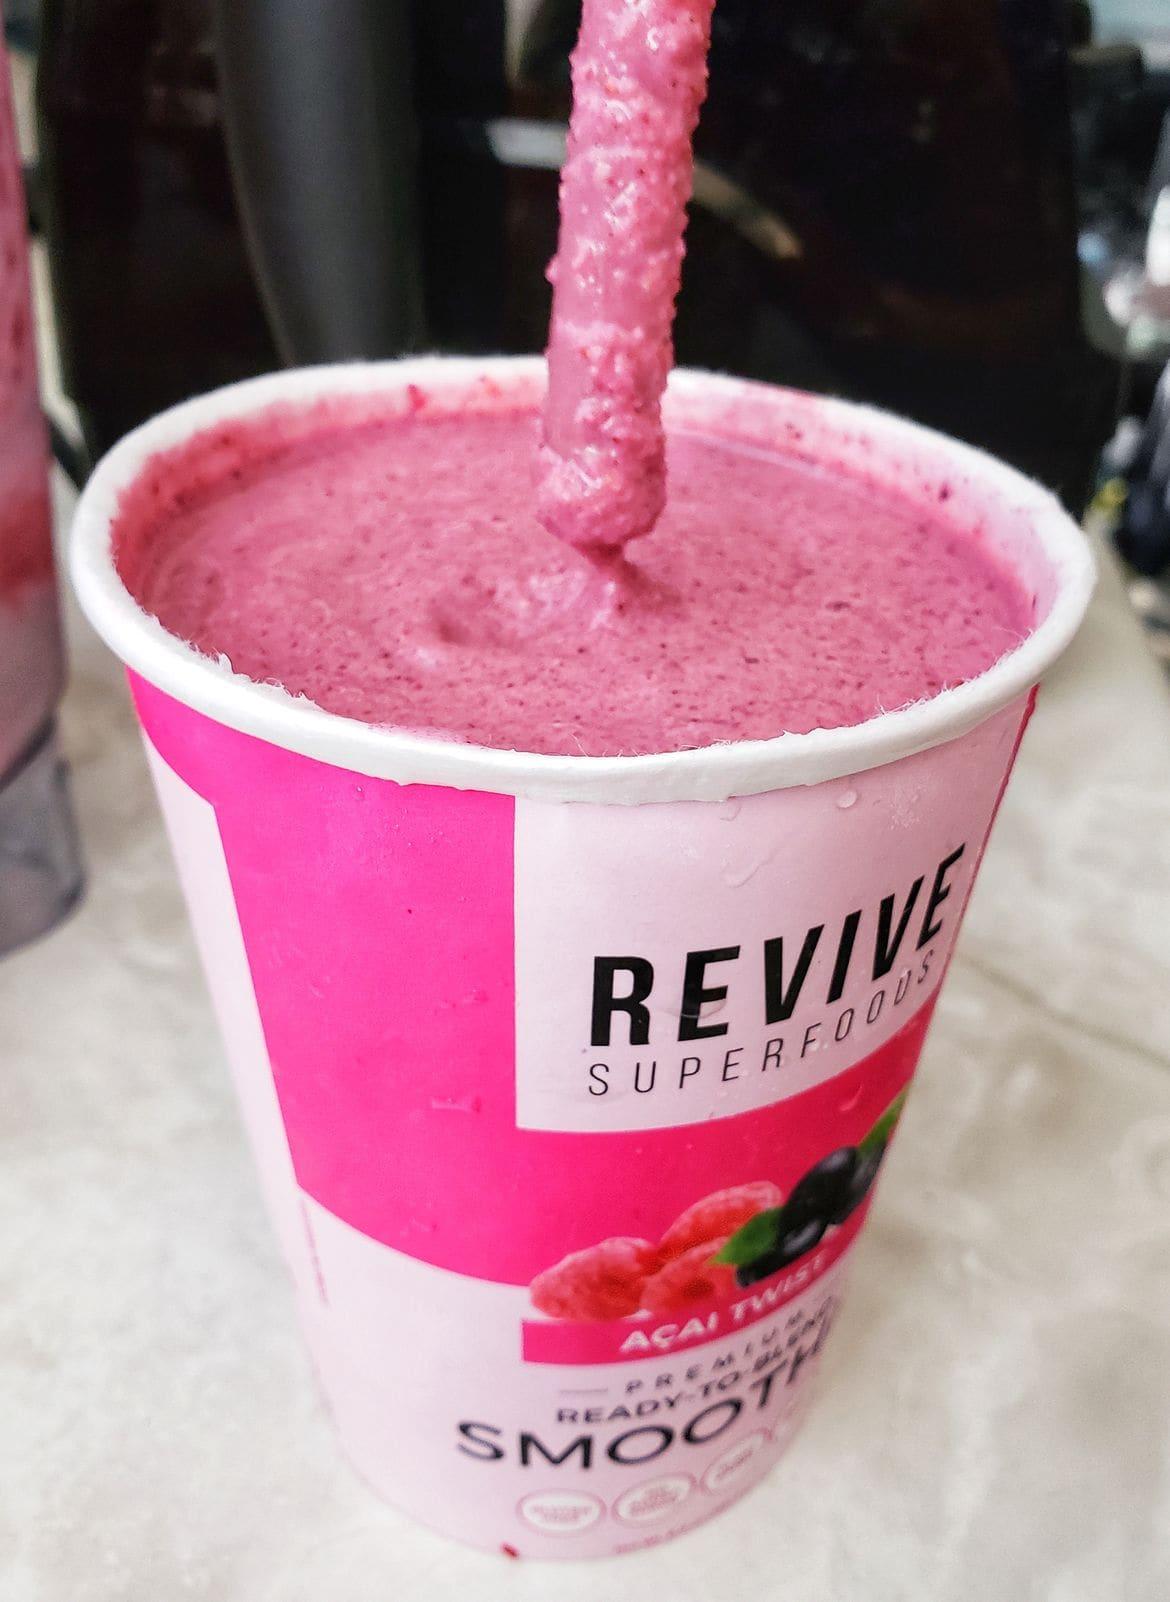 revive smoothie ready to enjoy